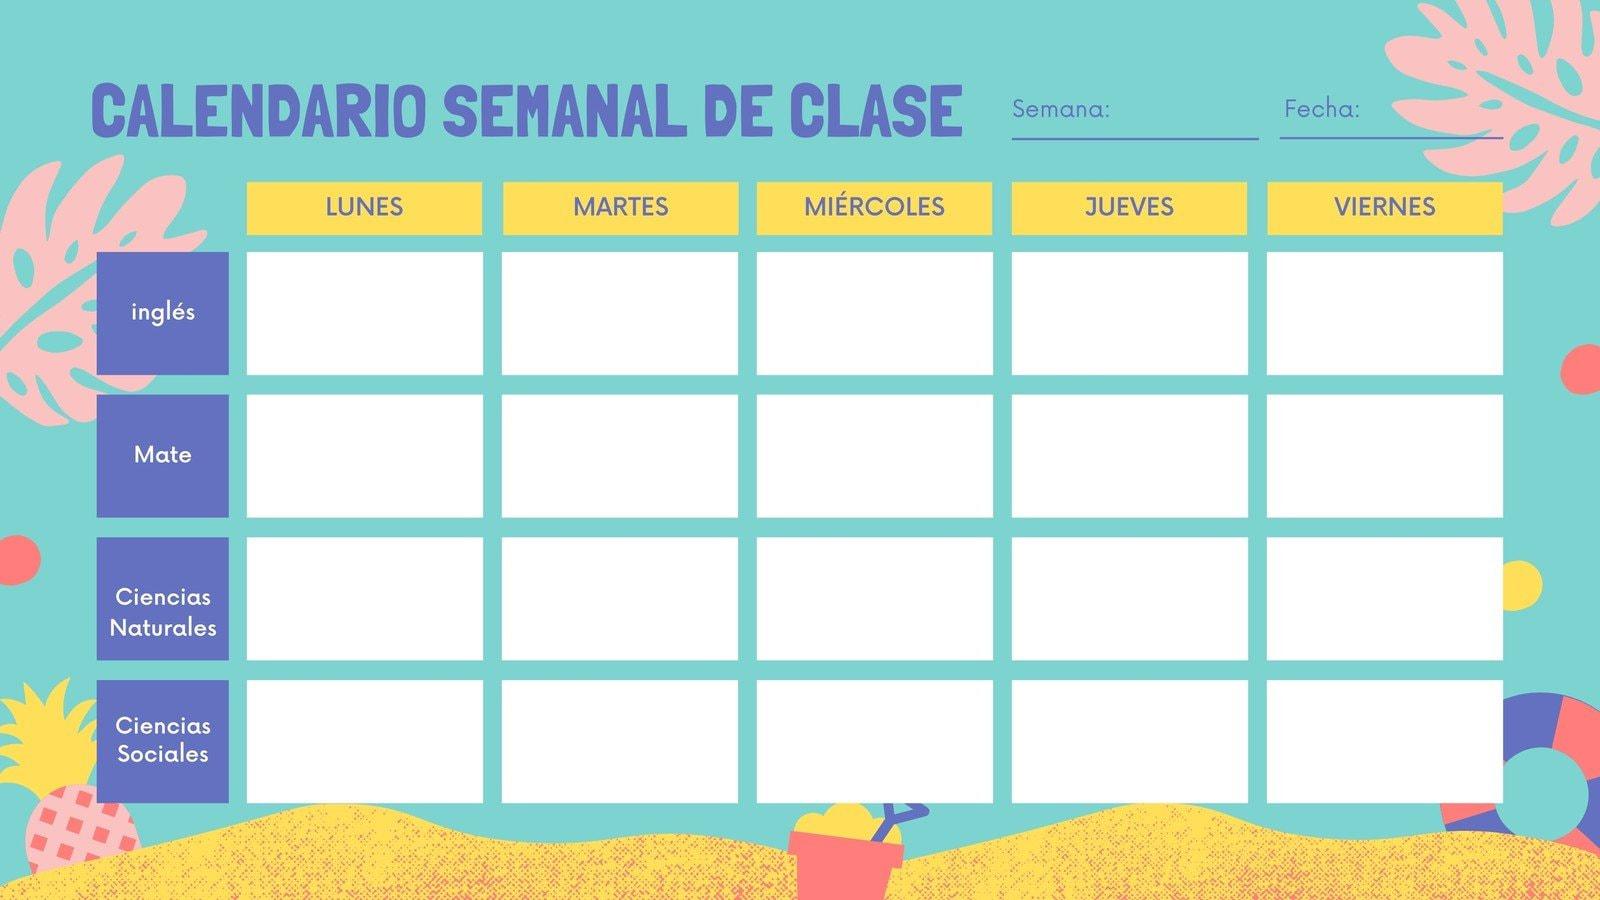 Playa Calendario Semanal para Aula de Clases en Blanco